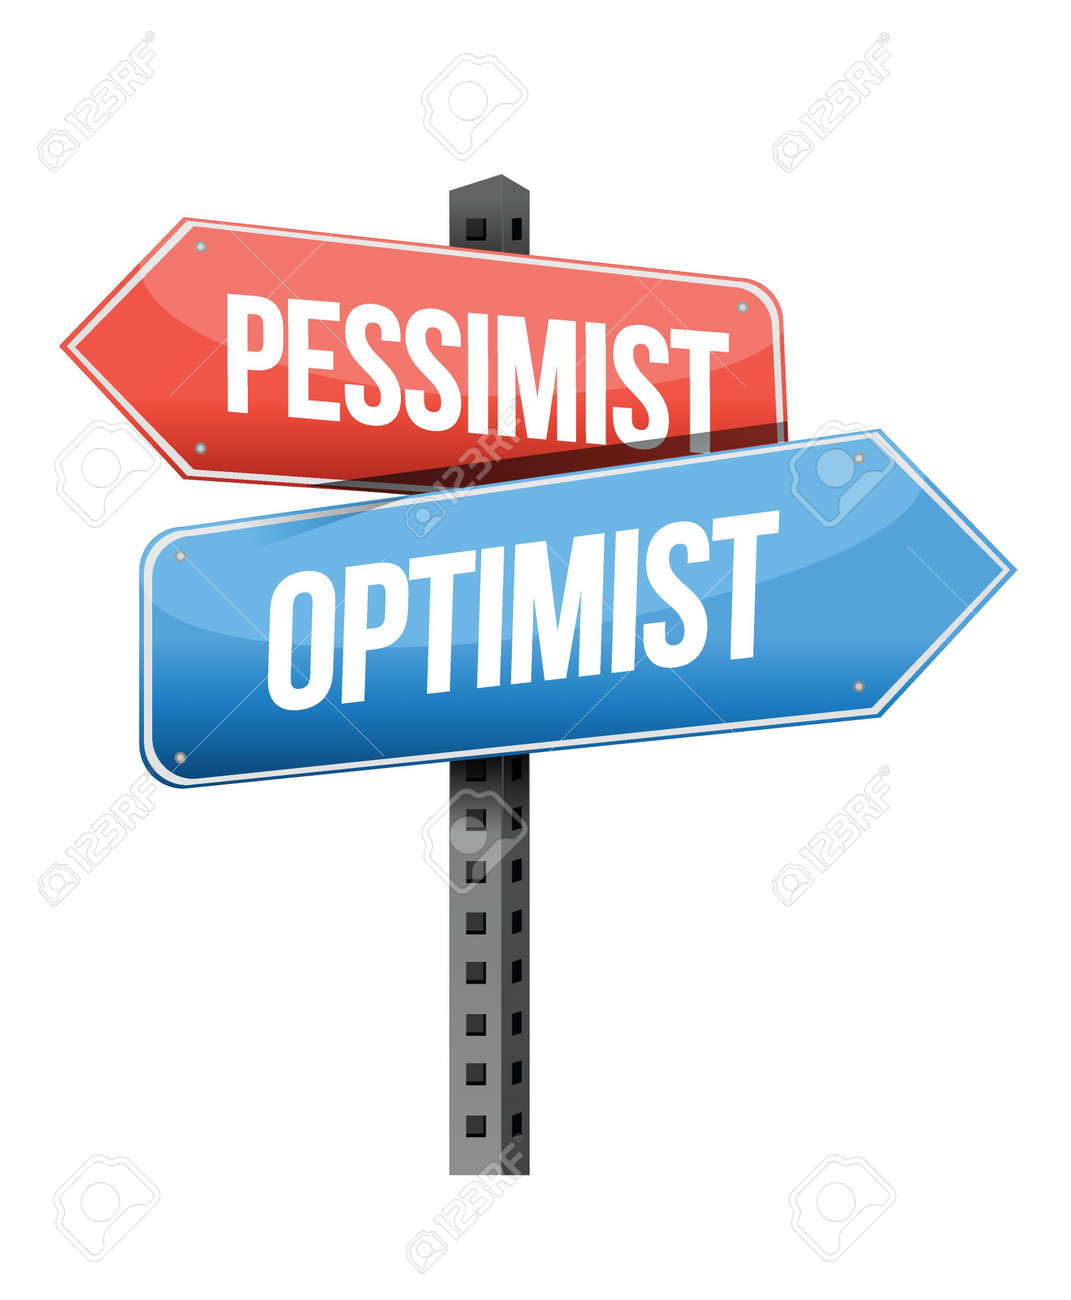 worksheet Synonym Antonym pessimist optimist road sign illustration design over a white vector background